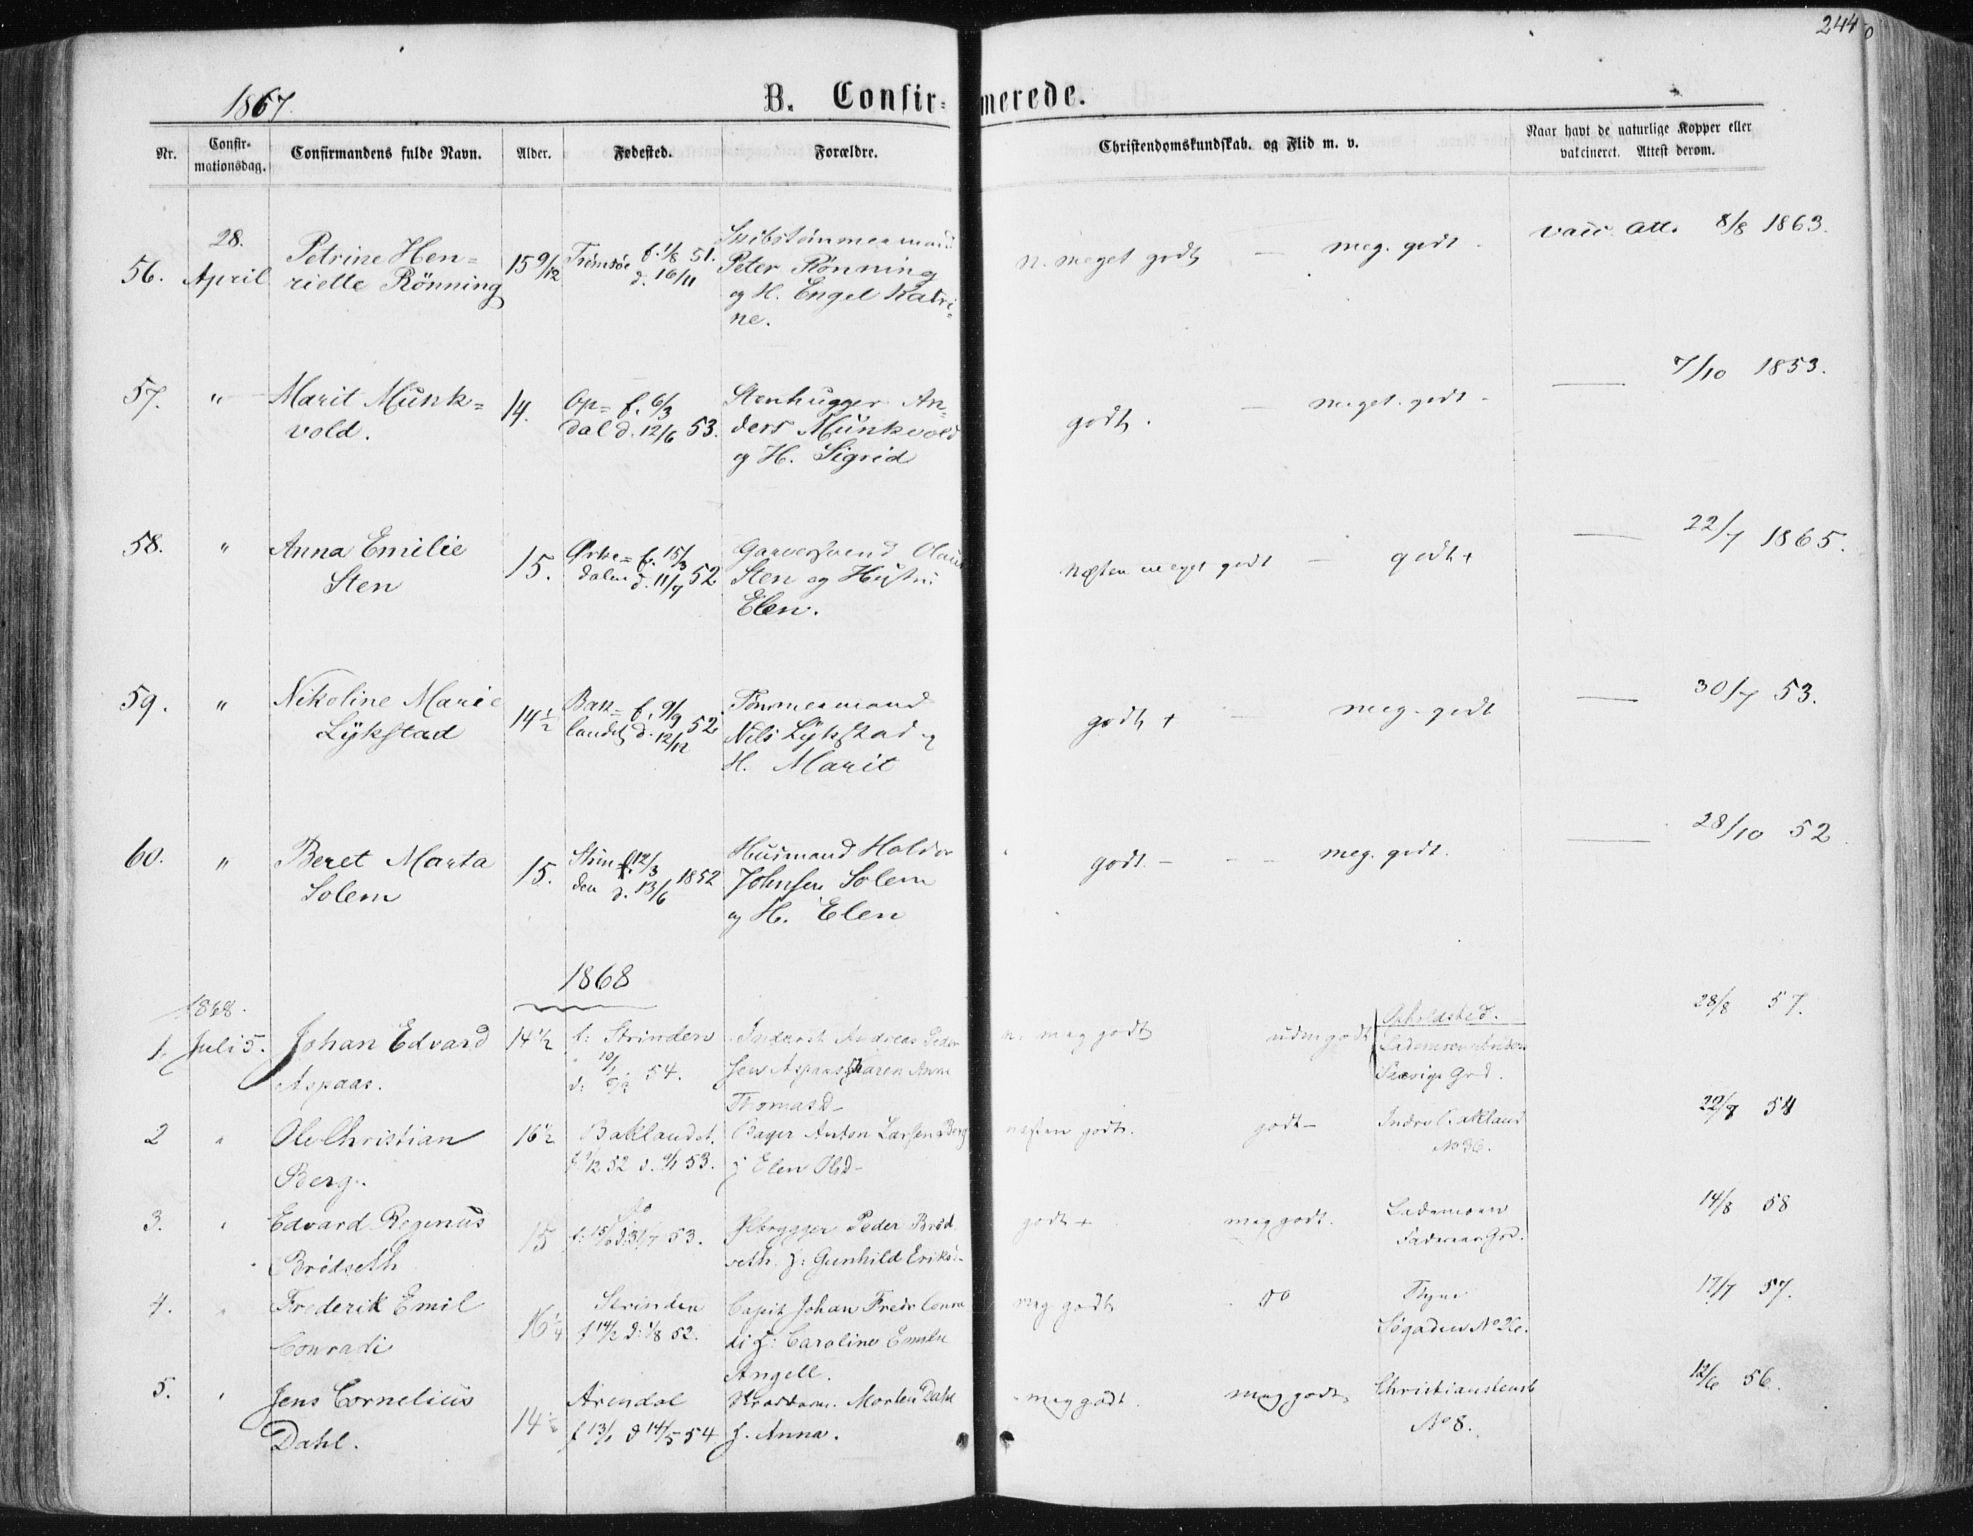 SAT, Ministerialprotokoller, klokkerbøker og fødselsregistre - Sør-Trøndelag, 604/L0186: Parish register (official) no. 604A07, 1866-1877, p. 244